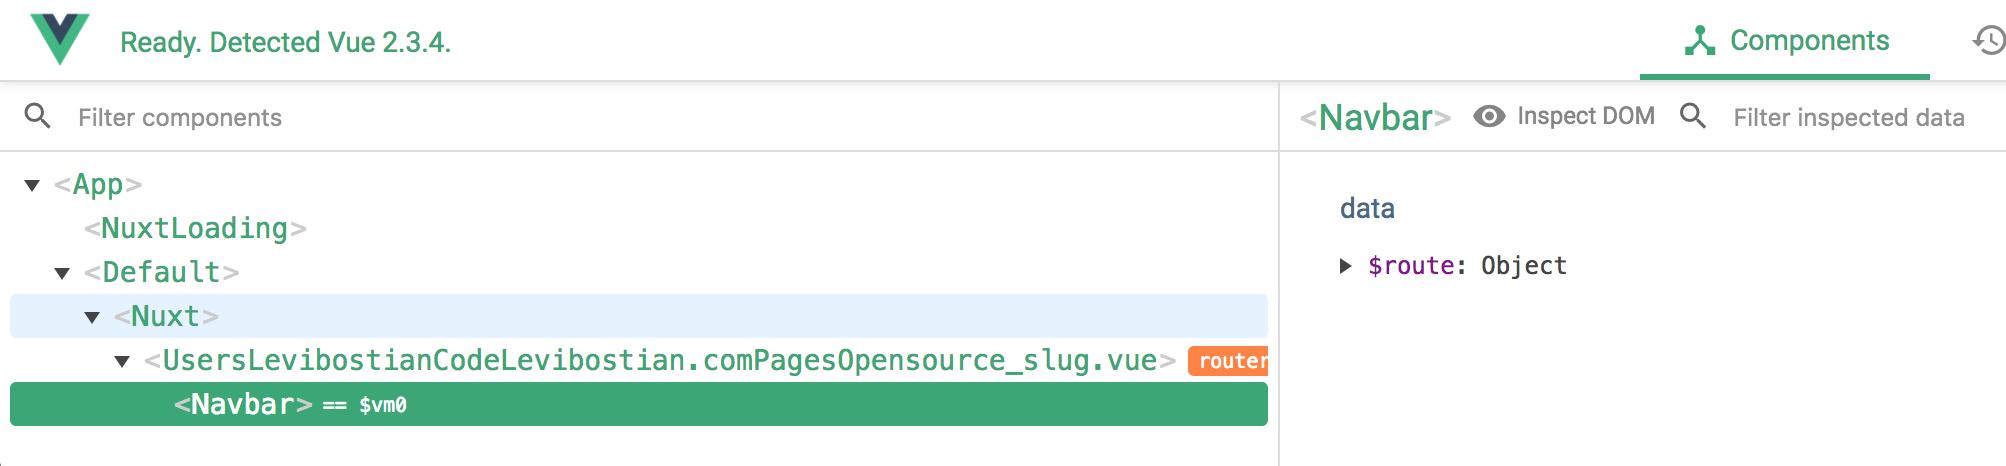 Nuxtent content pages do not allow Vuejs components before